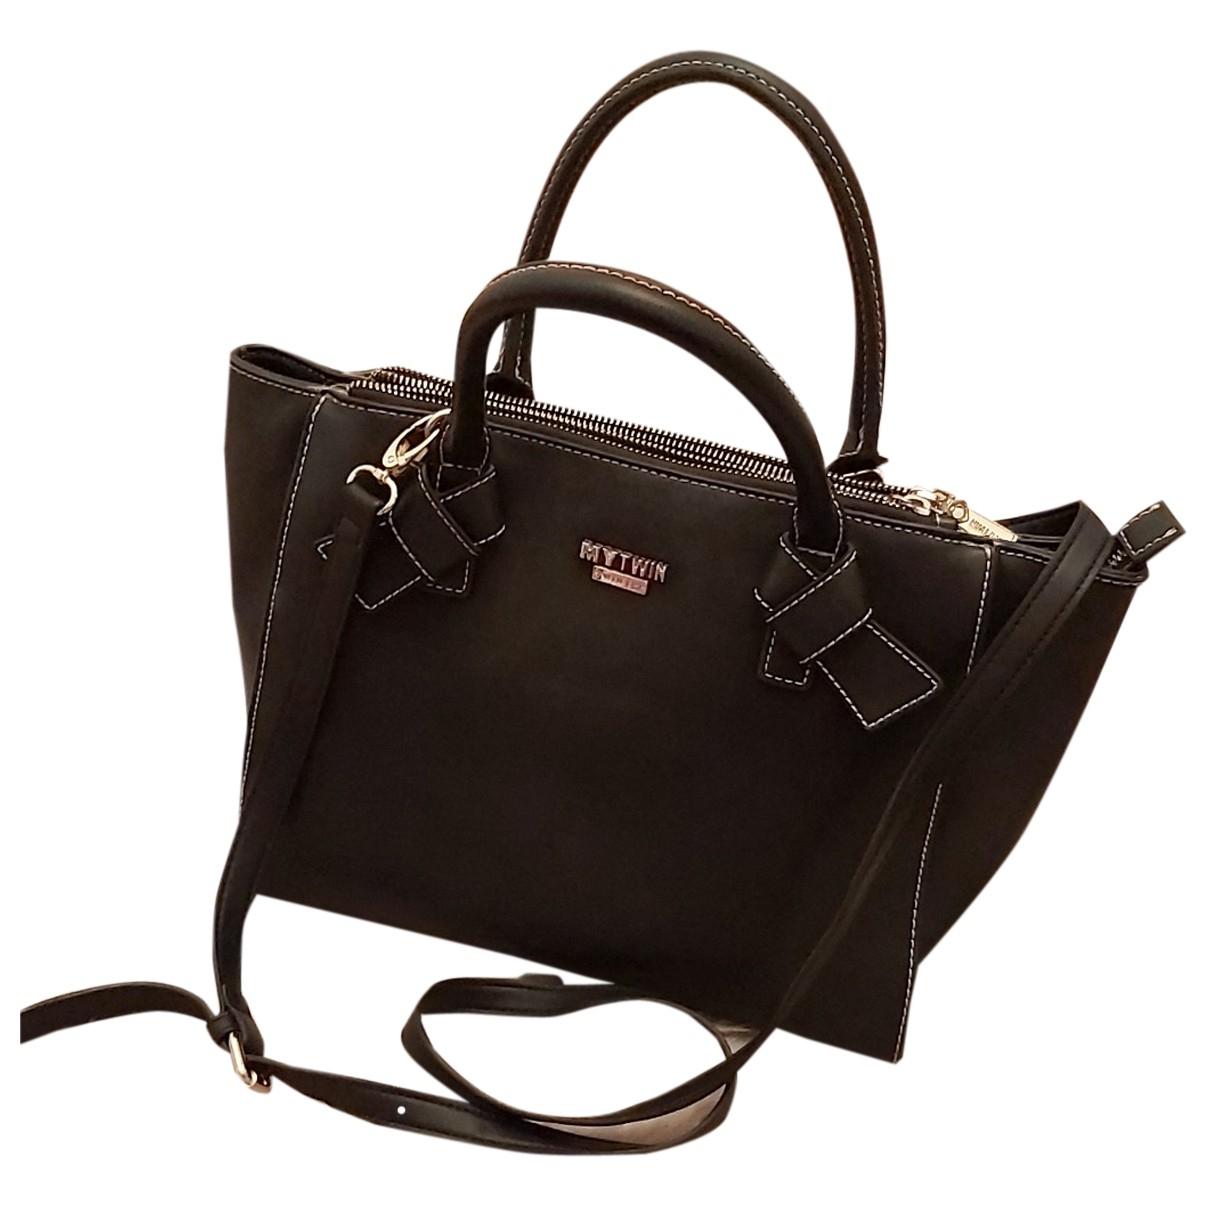 Twin Set N Black Leather handbag for Women N